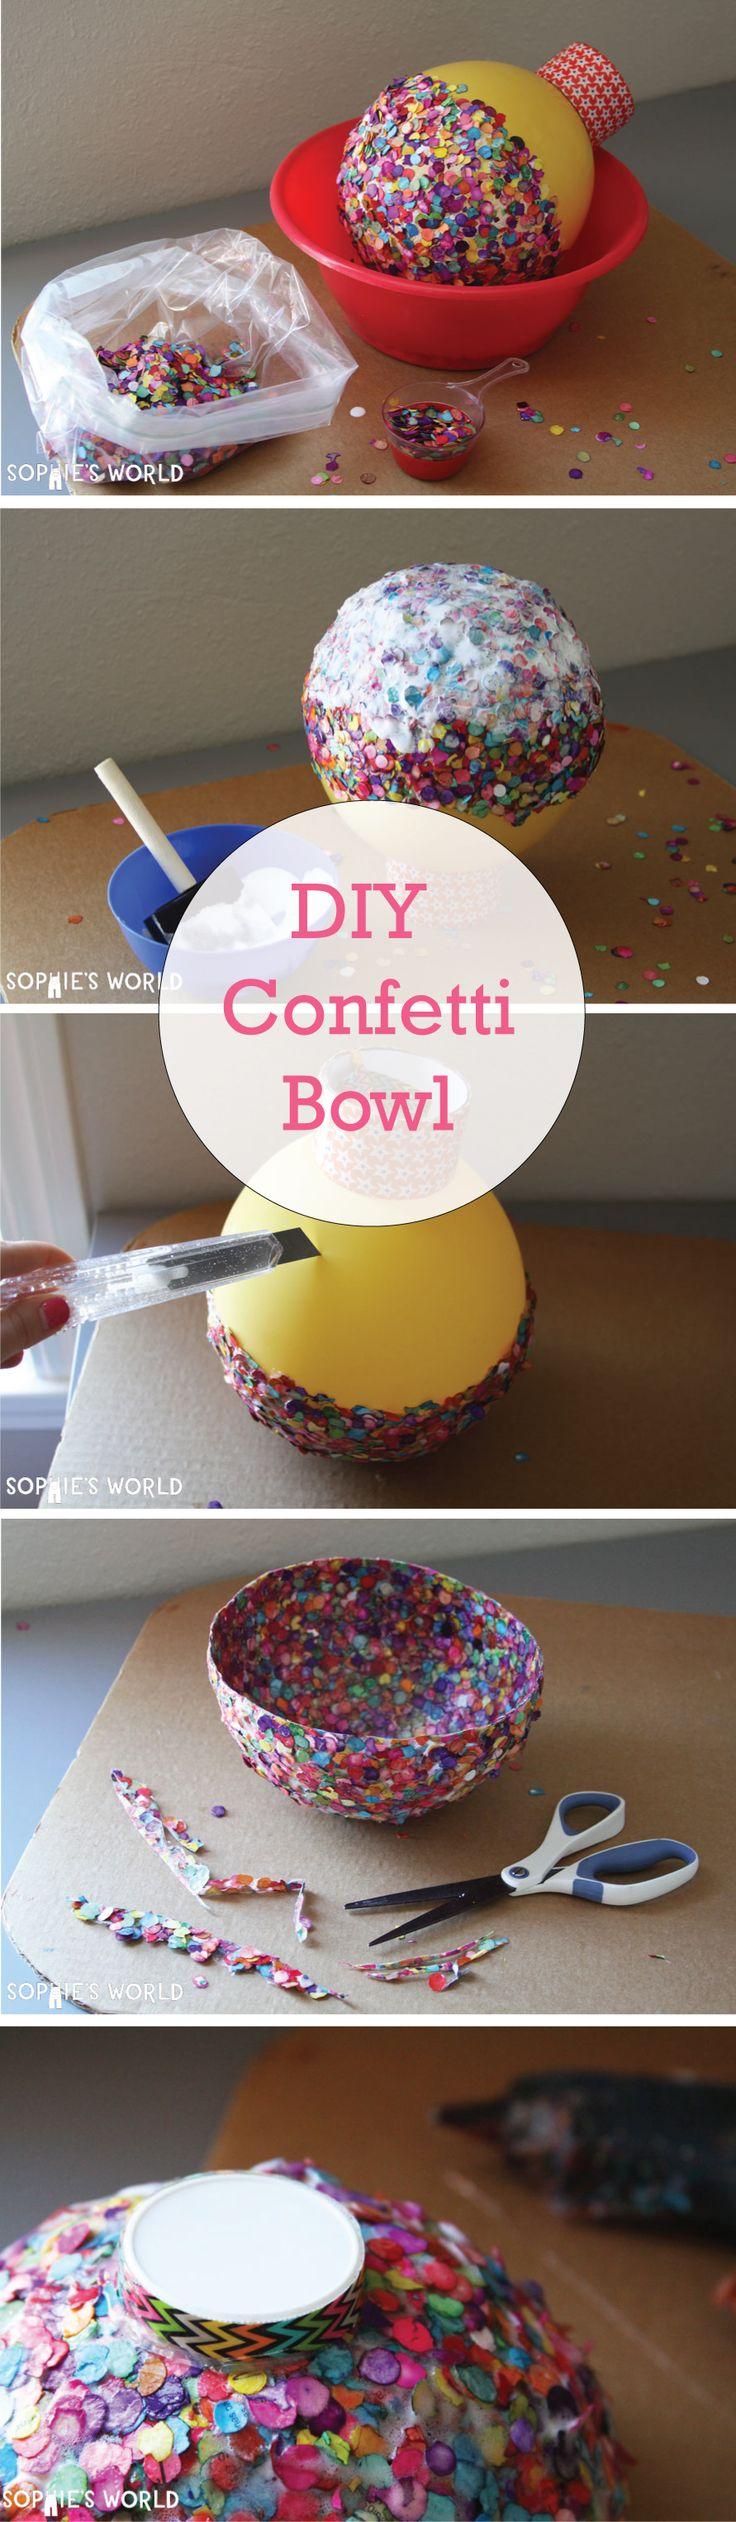 DIY Confetti Bowl #sophies #world #diy #confetti #craft #crafts #decor http://sophie-world.com/crafts/confetti-bowl